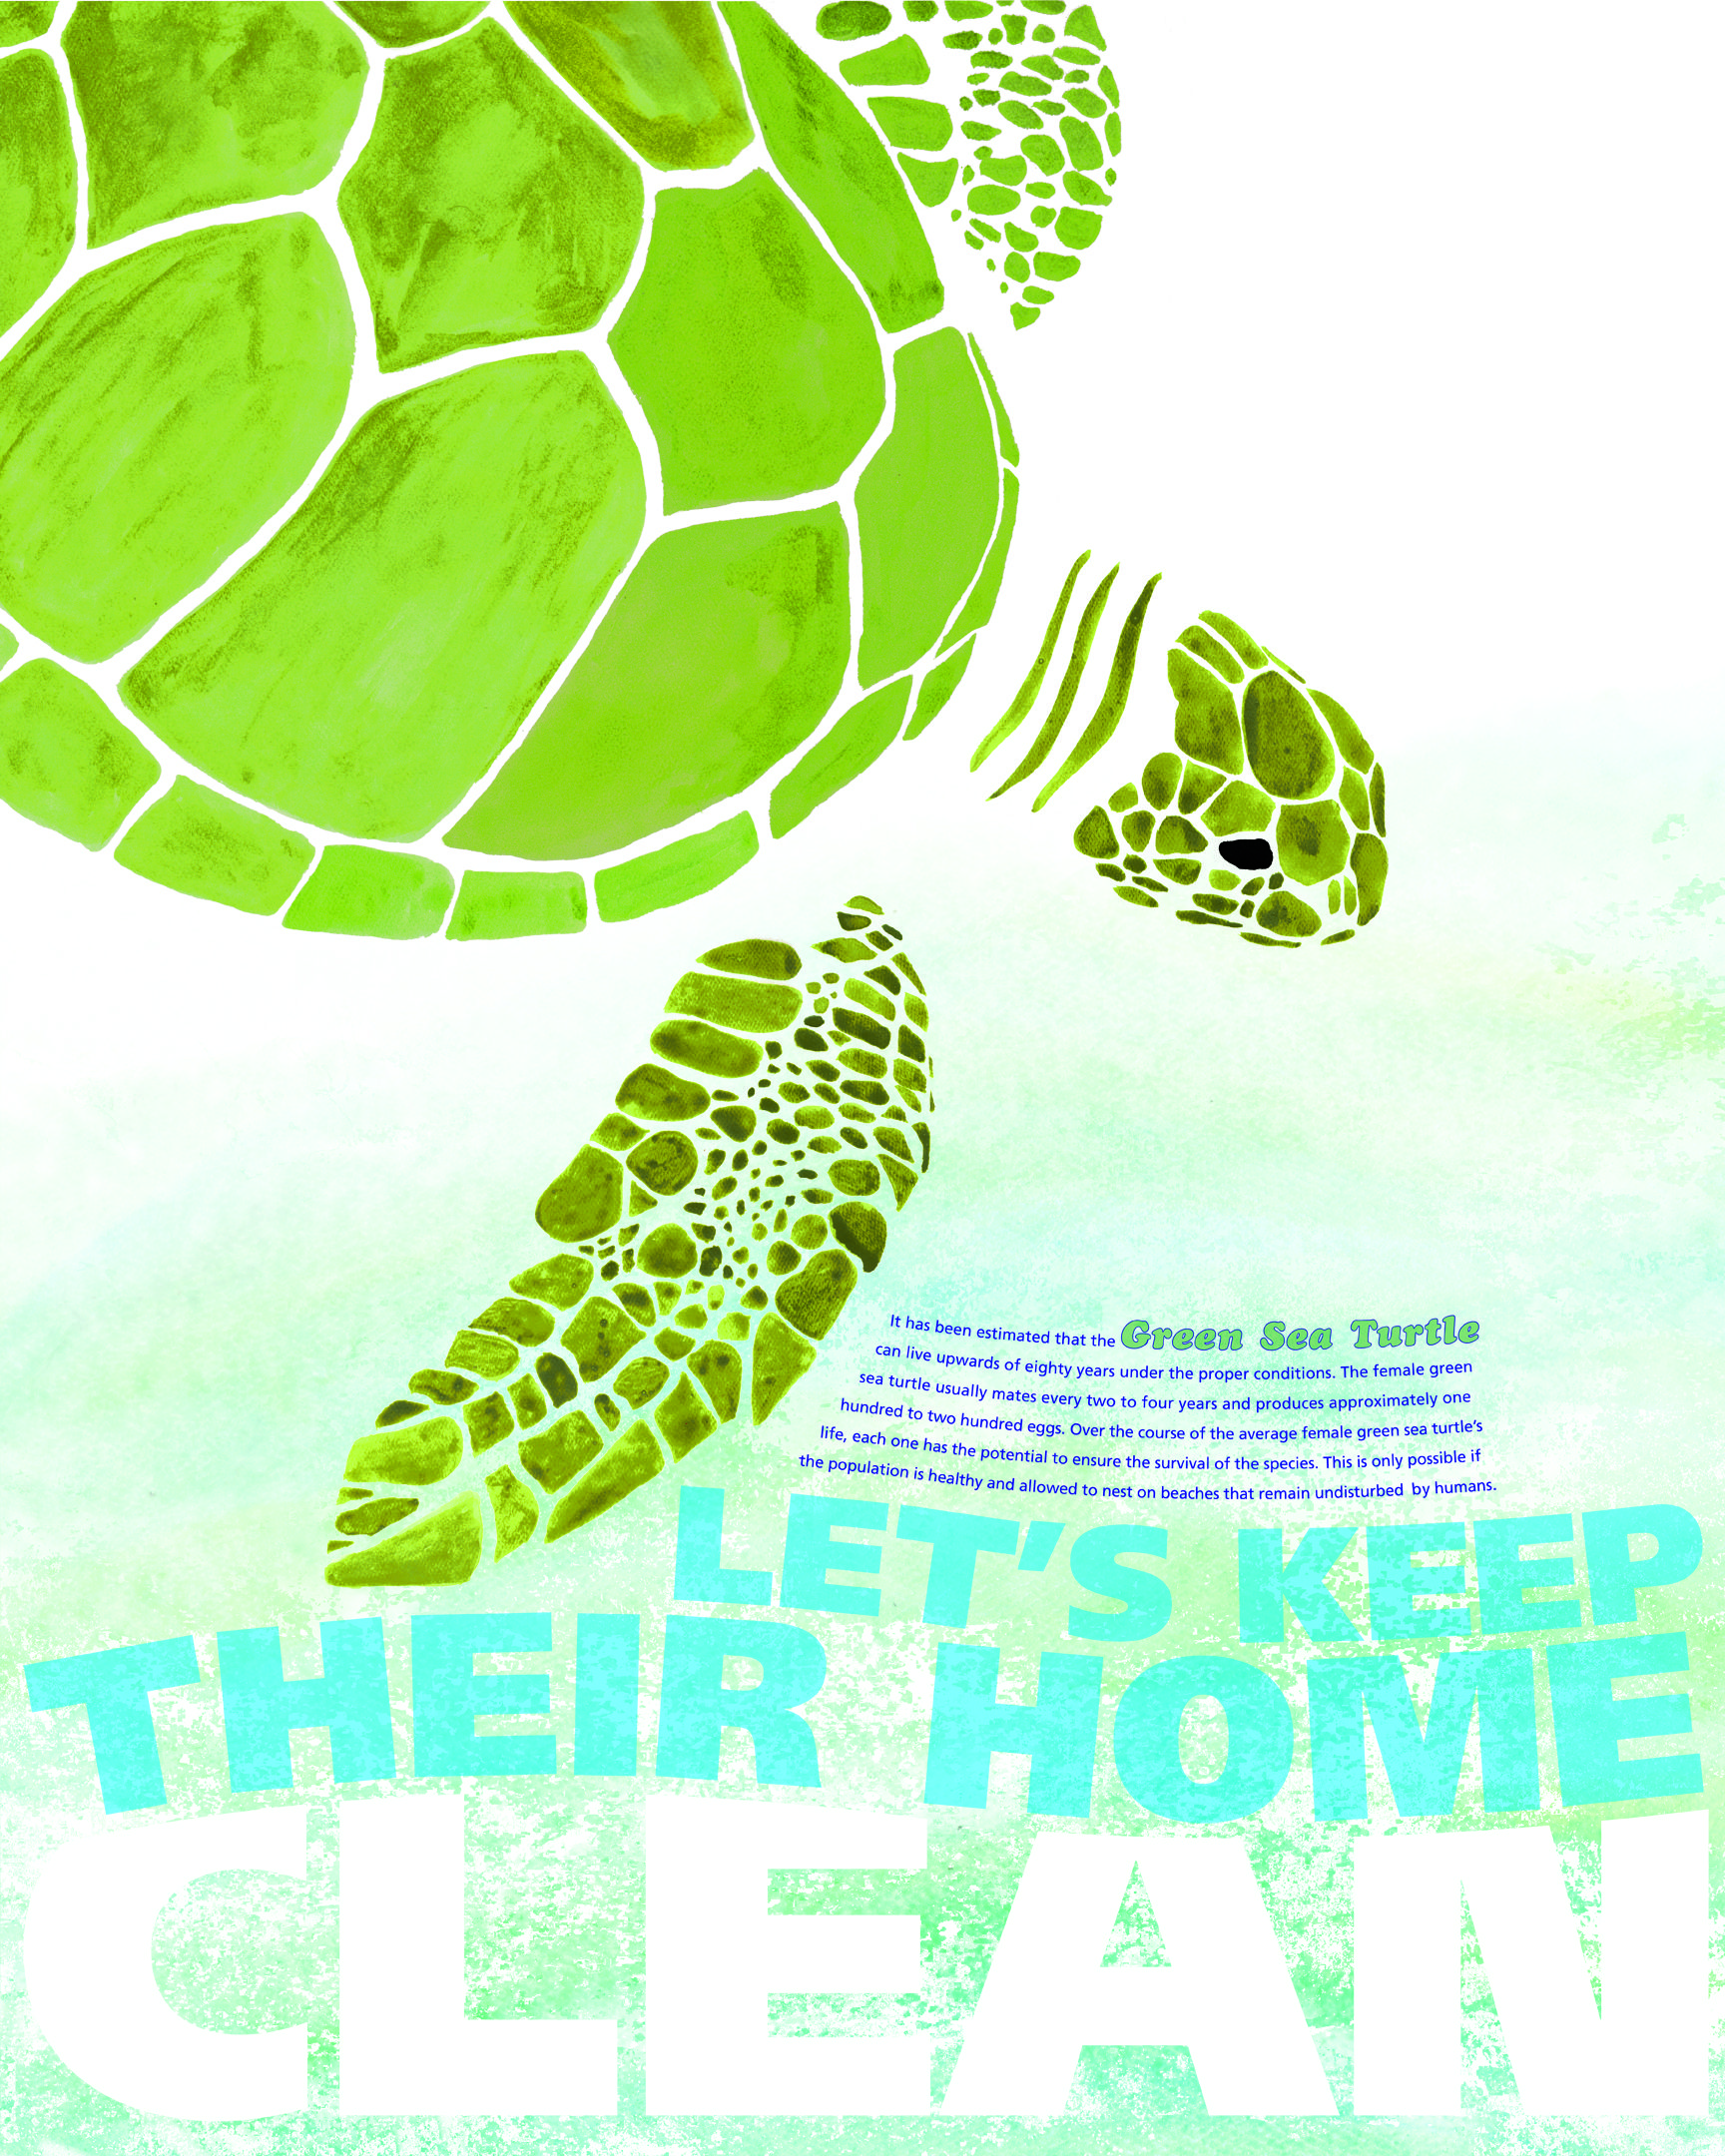 Texas Sea Turtle Daniel Carter Graphic design programs